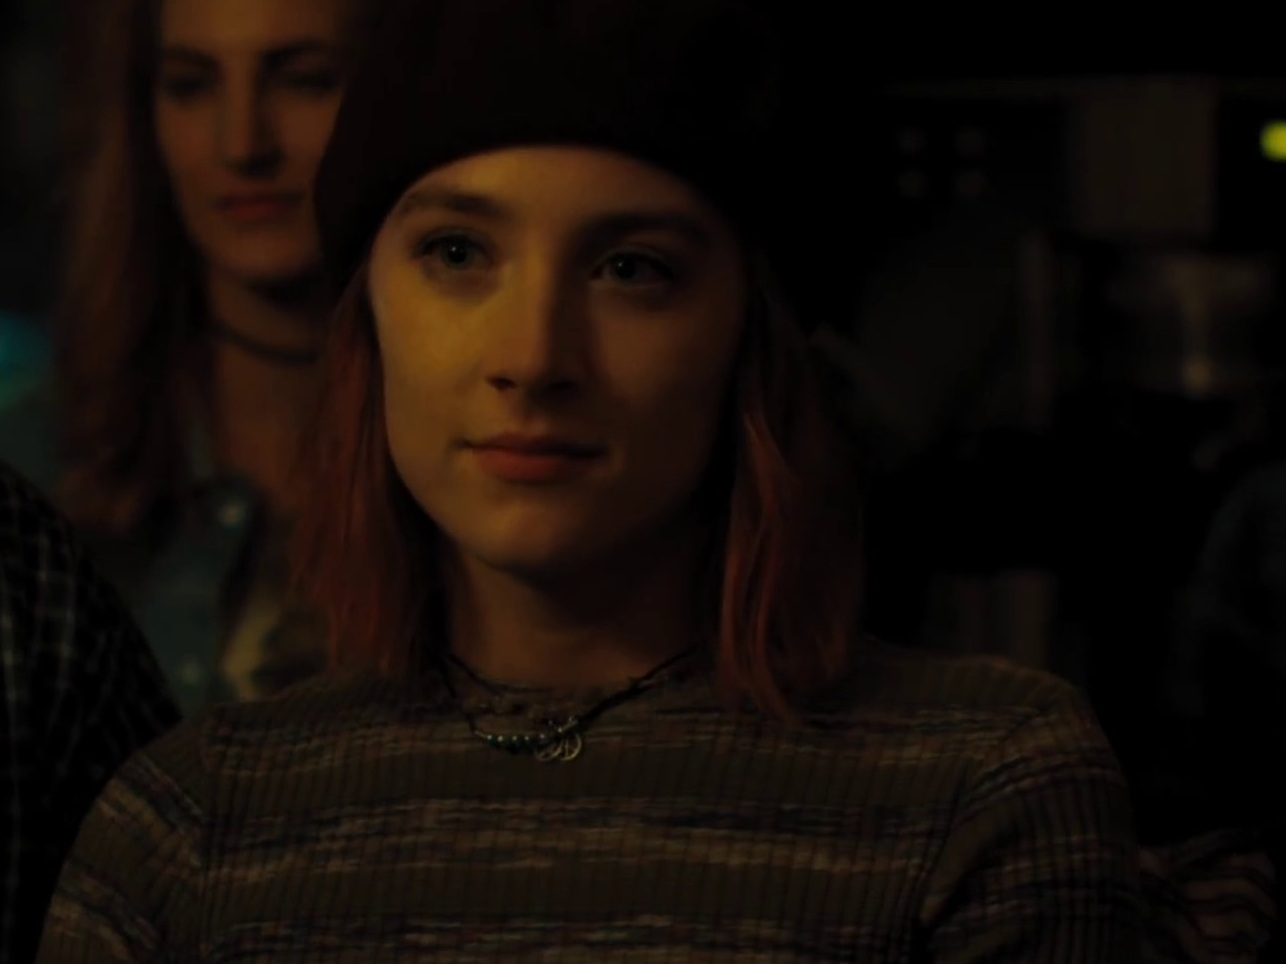 Saoirse-Ronan_actress_Lady-Bird_film_Greta-Gerwig_2017_movie-07.jpg